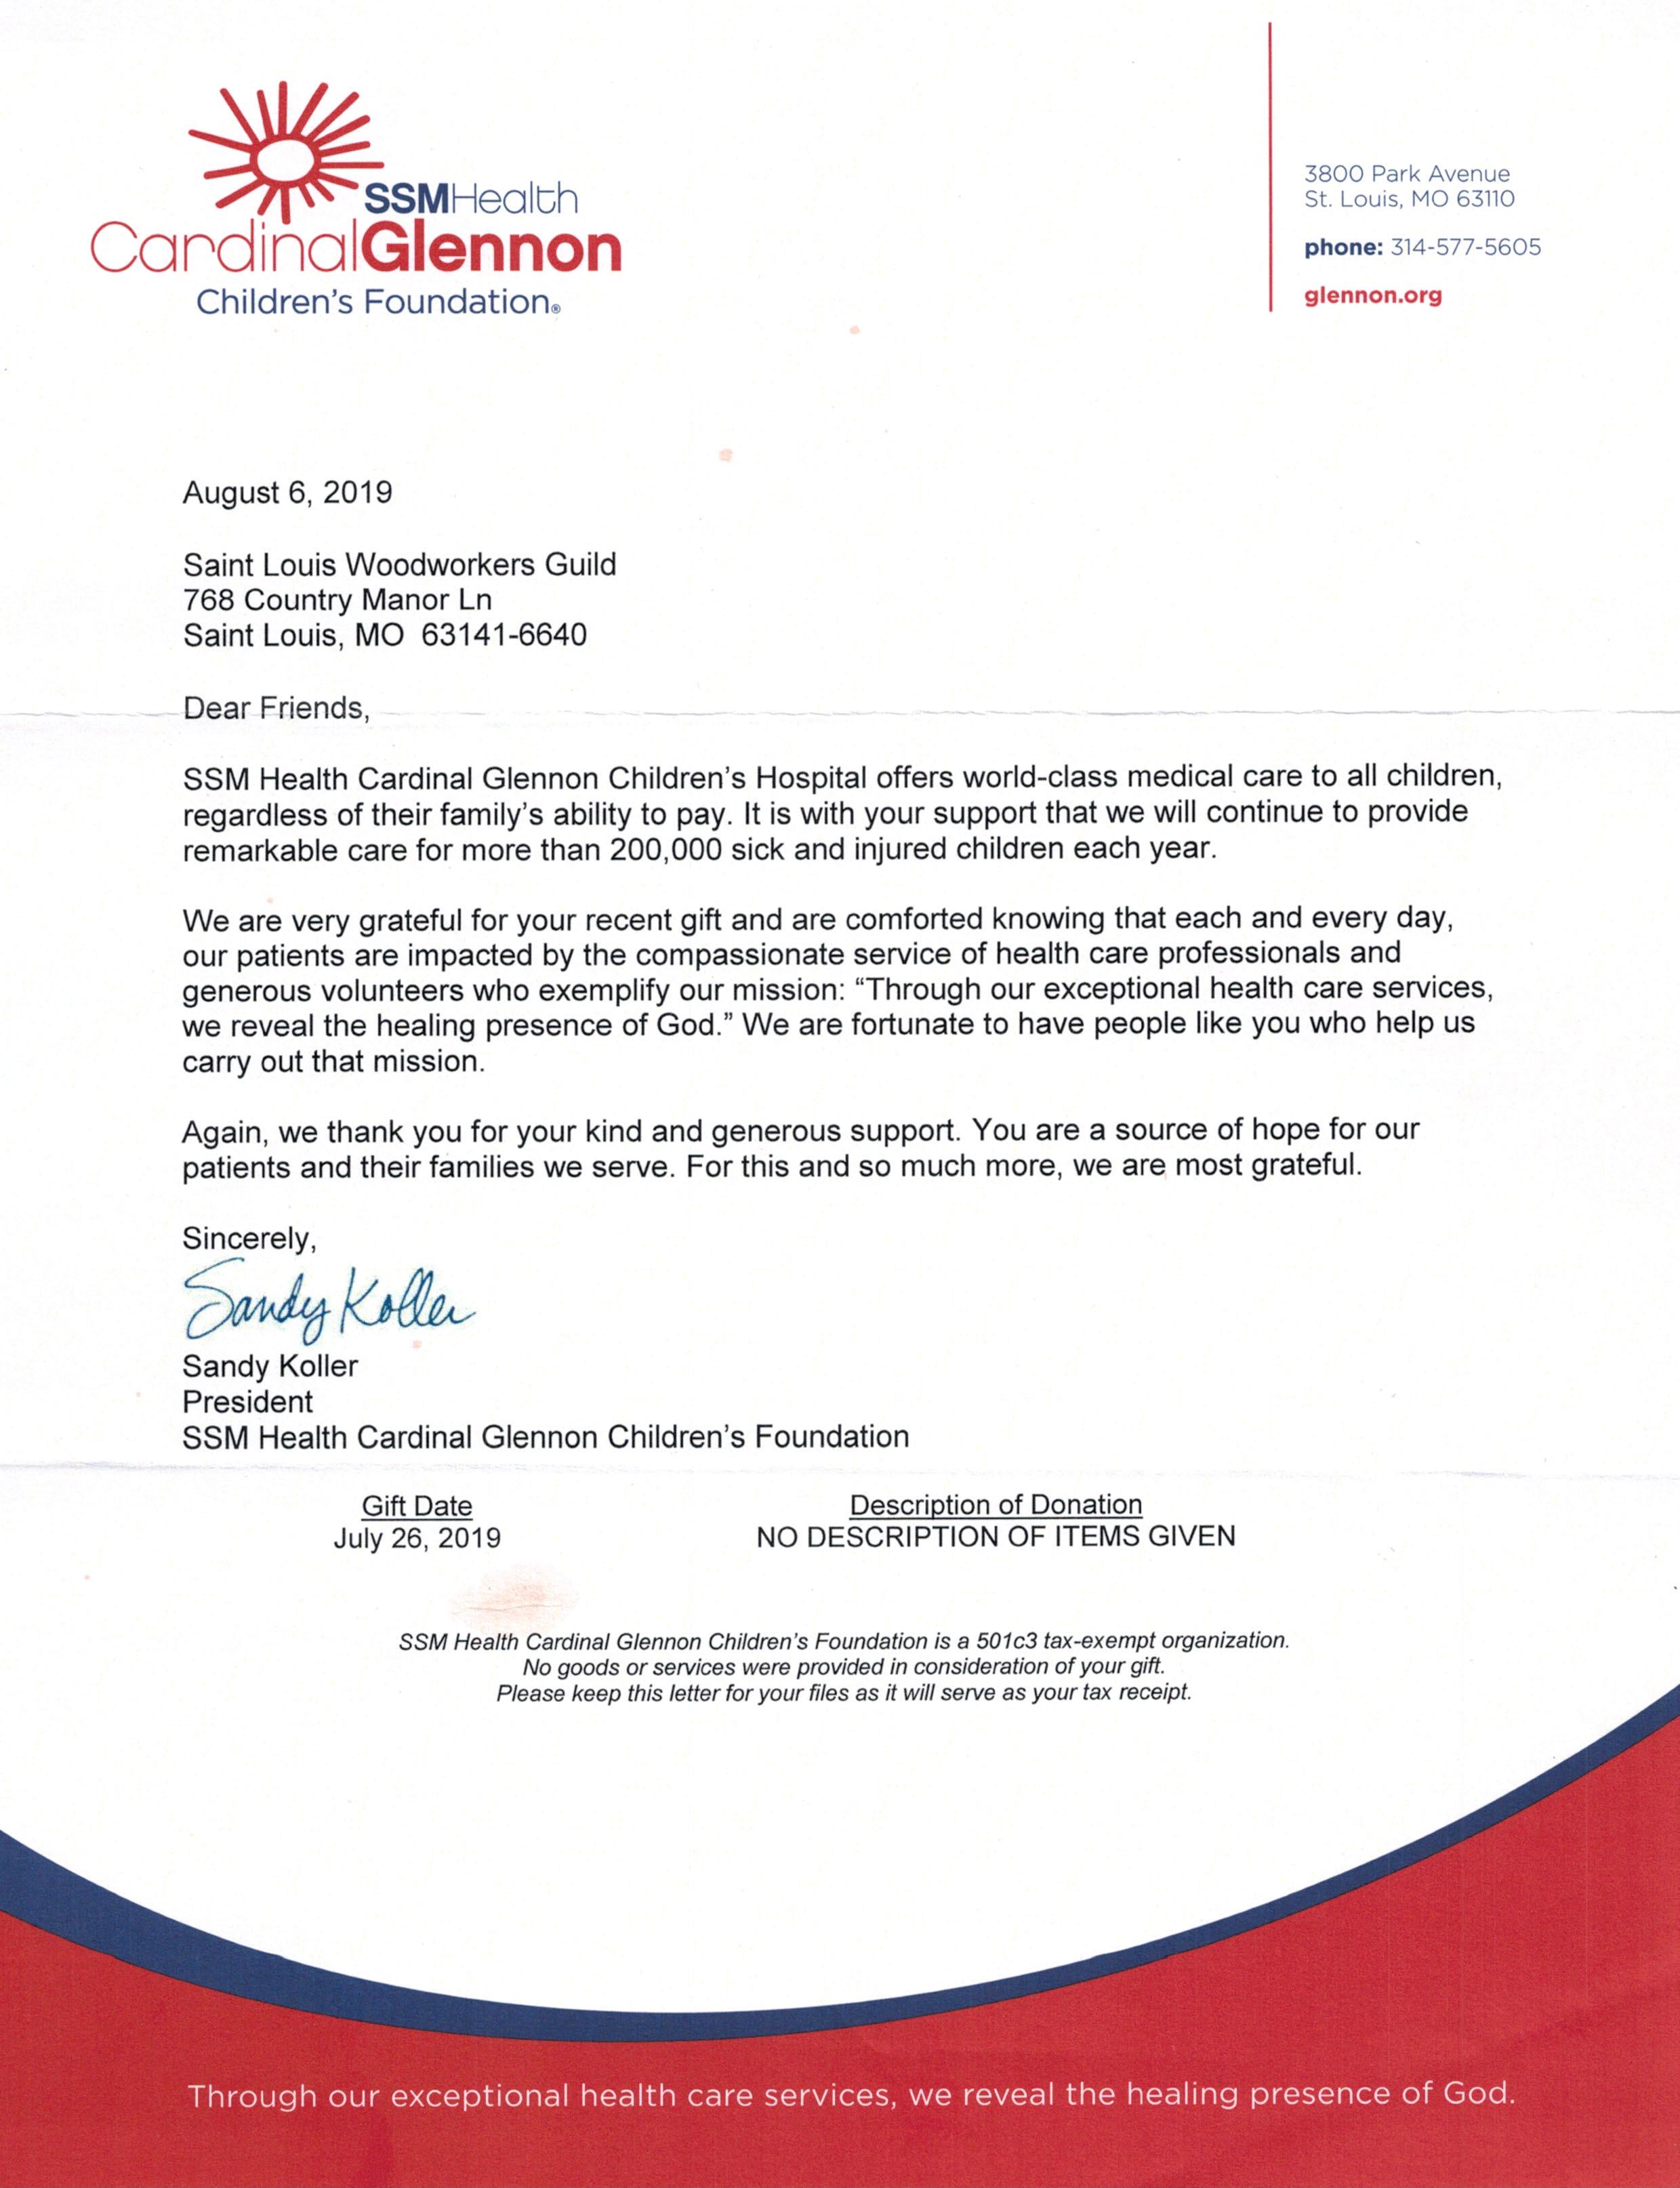 Thank you letter from SSM Health Cardinal Glennon Children's Foundation